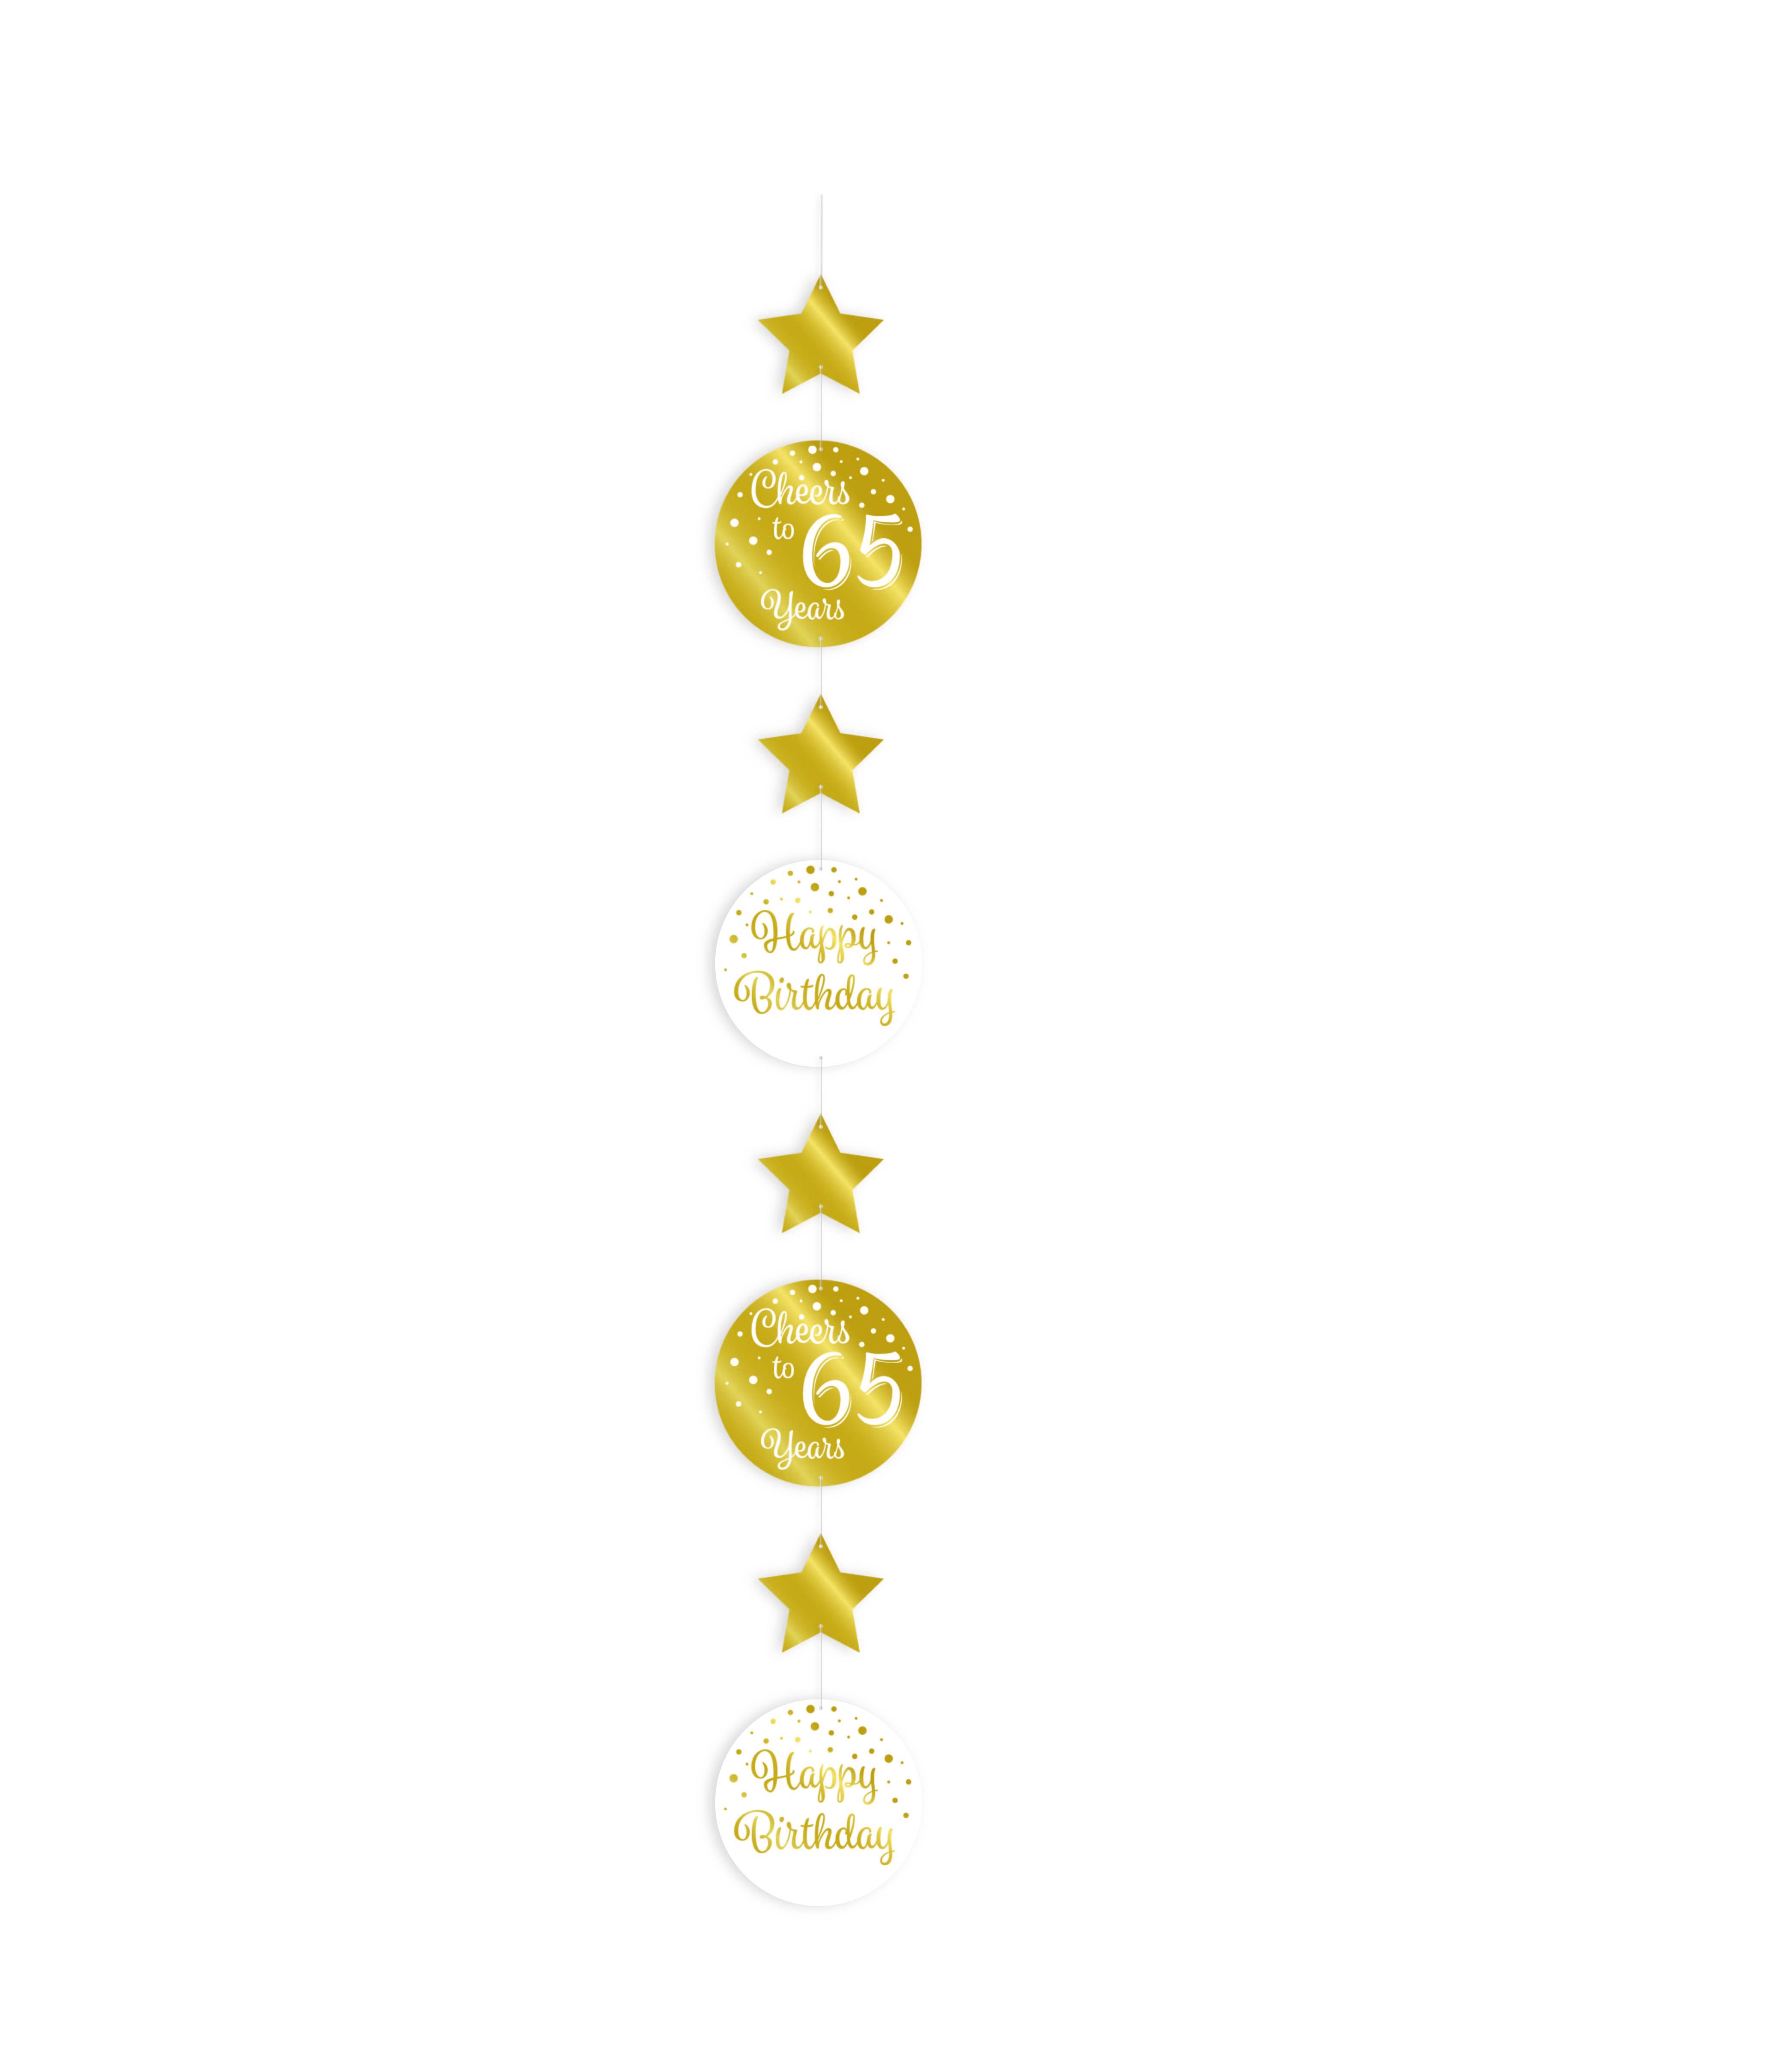 Hangdecoratie Goud/Wit Cheers to 65 Years